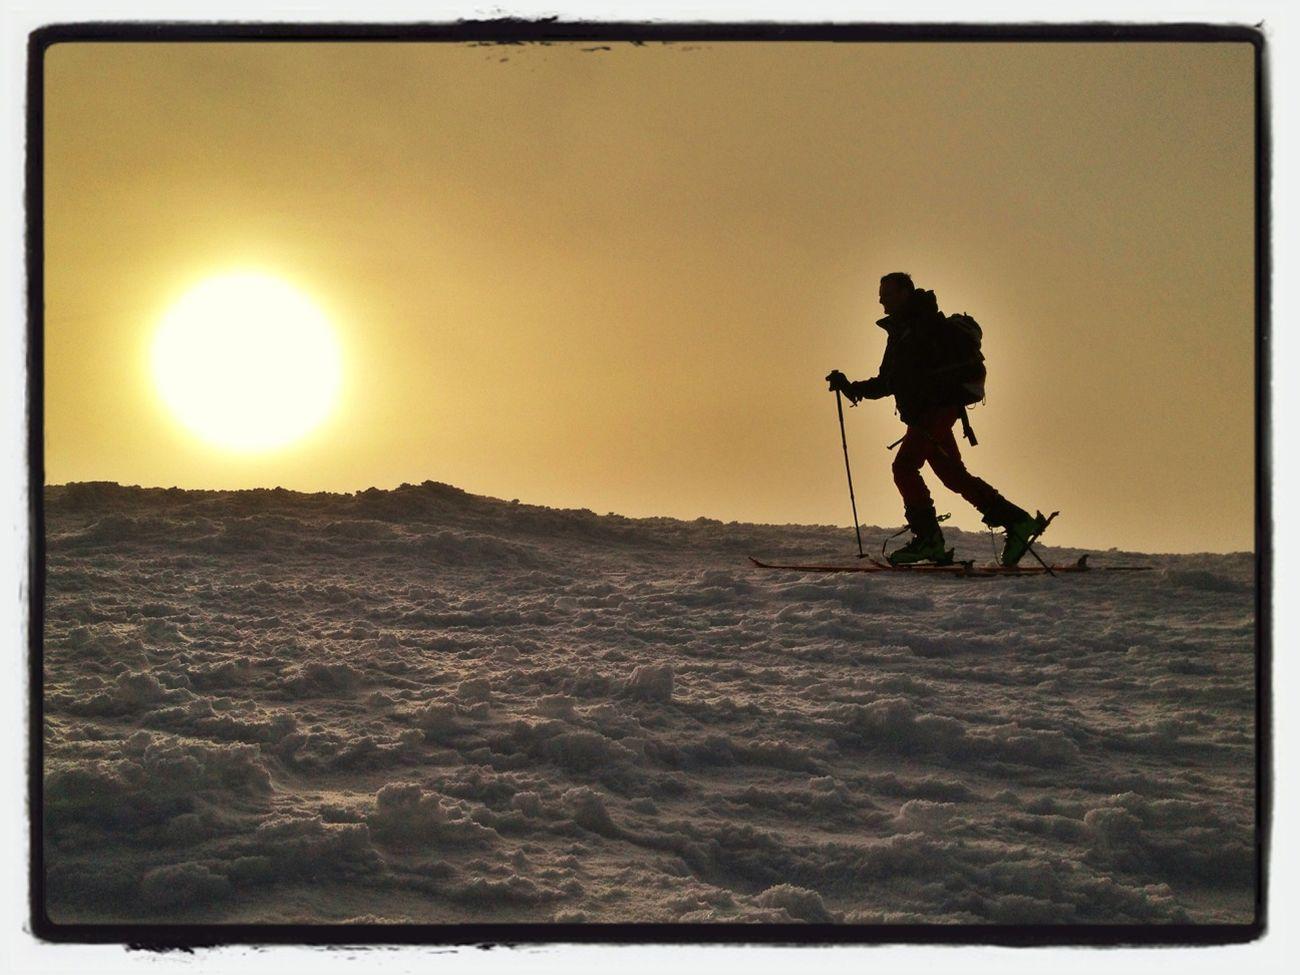 Contraluz Matutino #esquidemontaña #skimountaineering #skimo #training #mountain #ilovemountain #dynafit #spring #primavera #cotos #peñalara #gasss #amanecer #sunrise